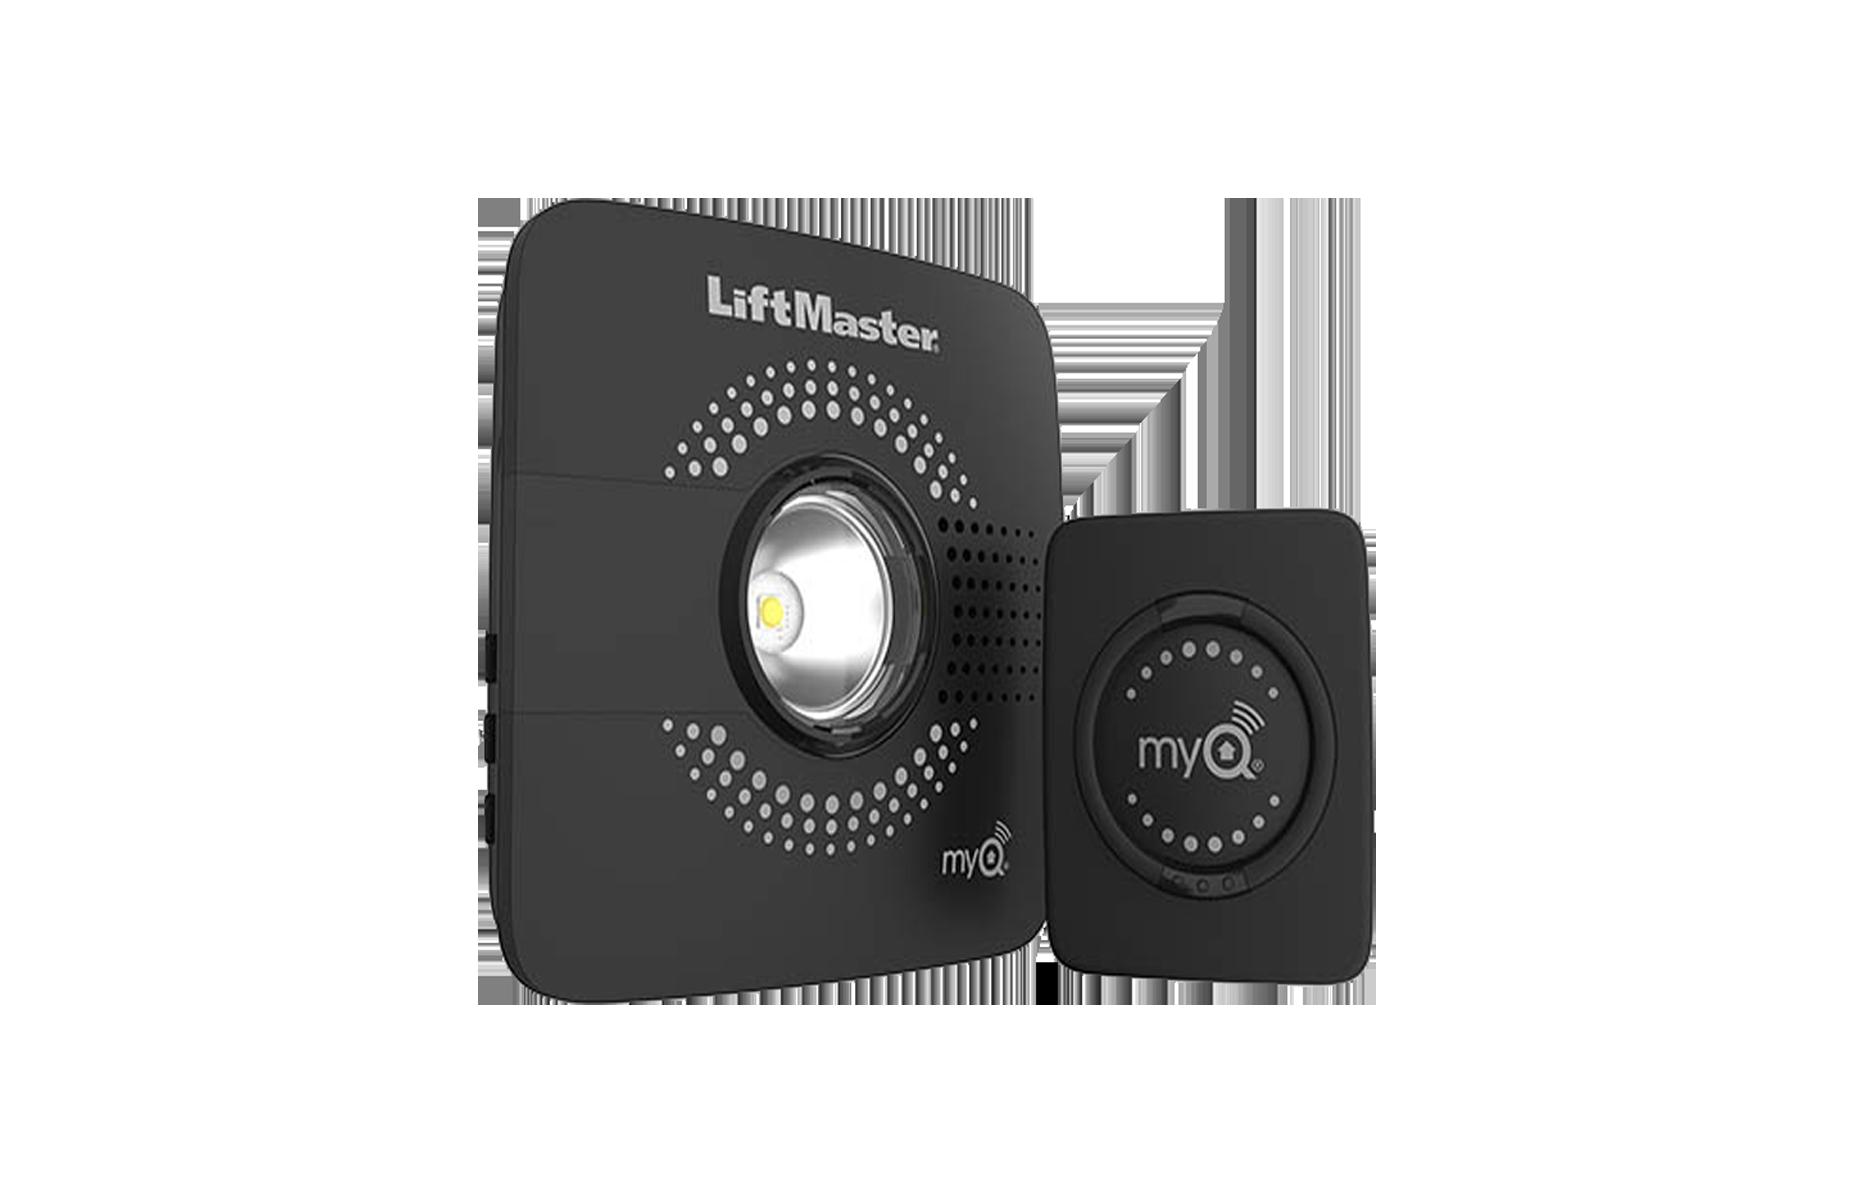 LMSGH_Card10m.png